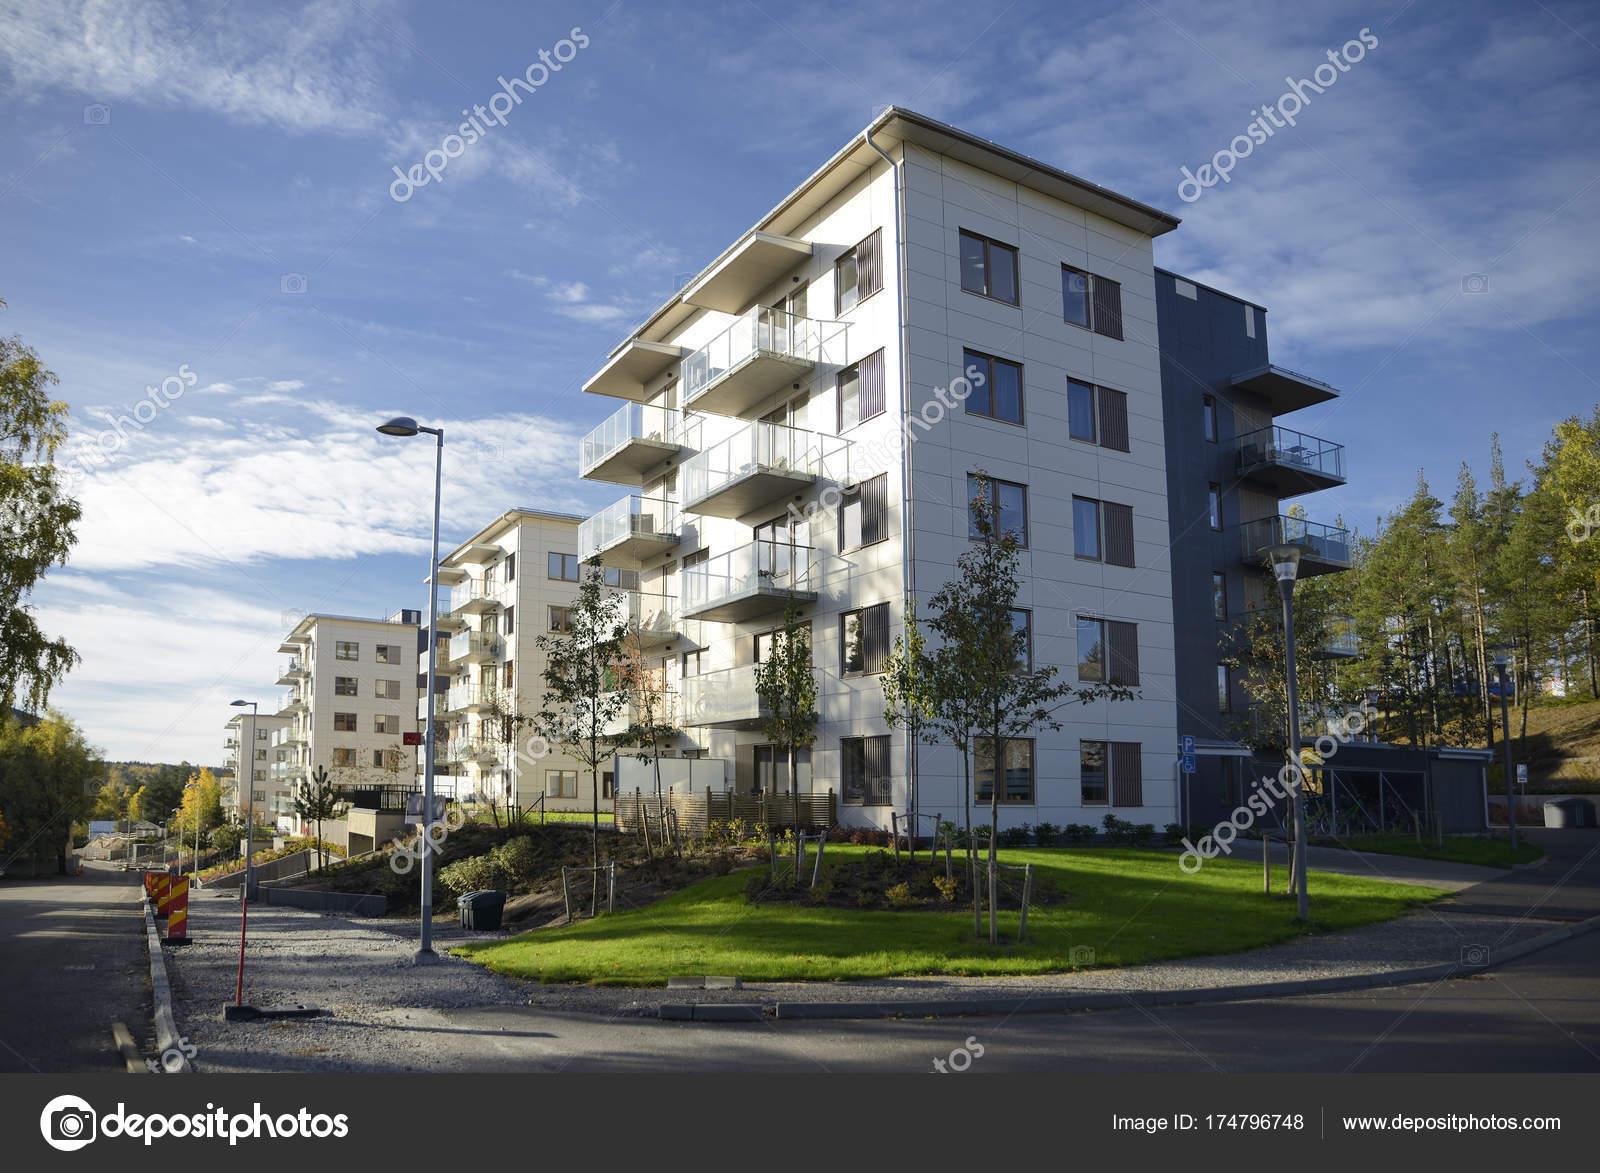 Großartig Moderne Mehrfamilienhäuser Sammlung Von Sind Mehrfamilienhäuser Stockholm Schweden — Stockfoto